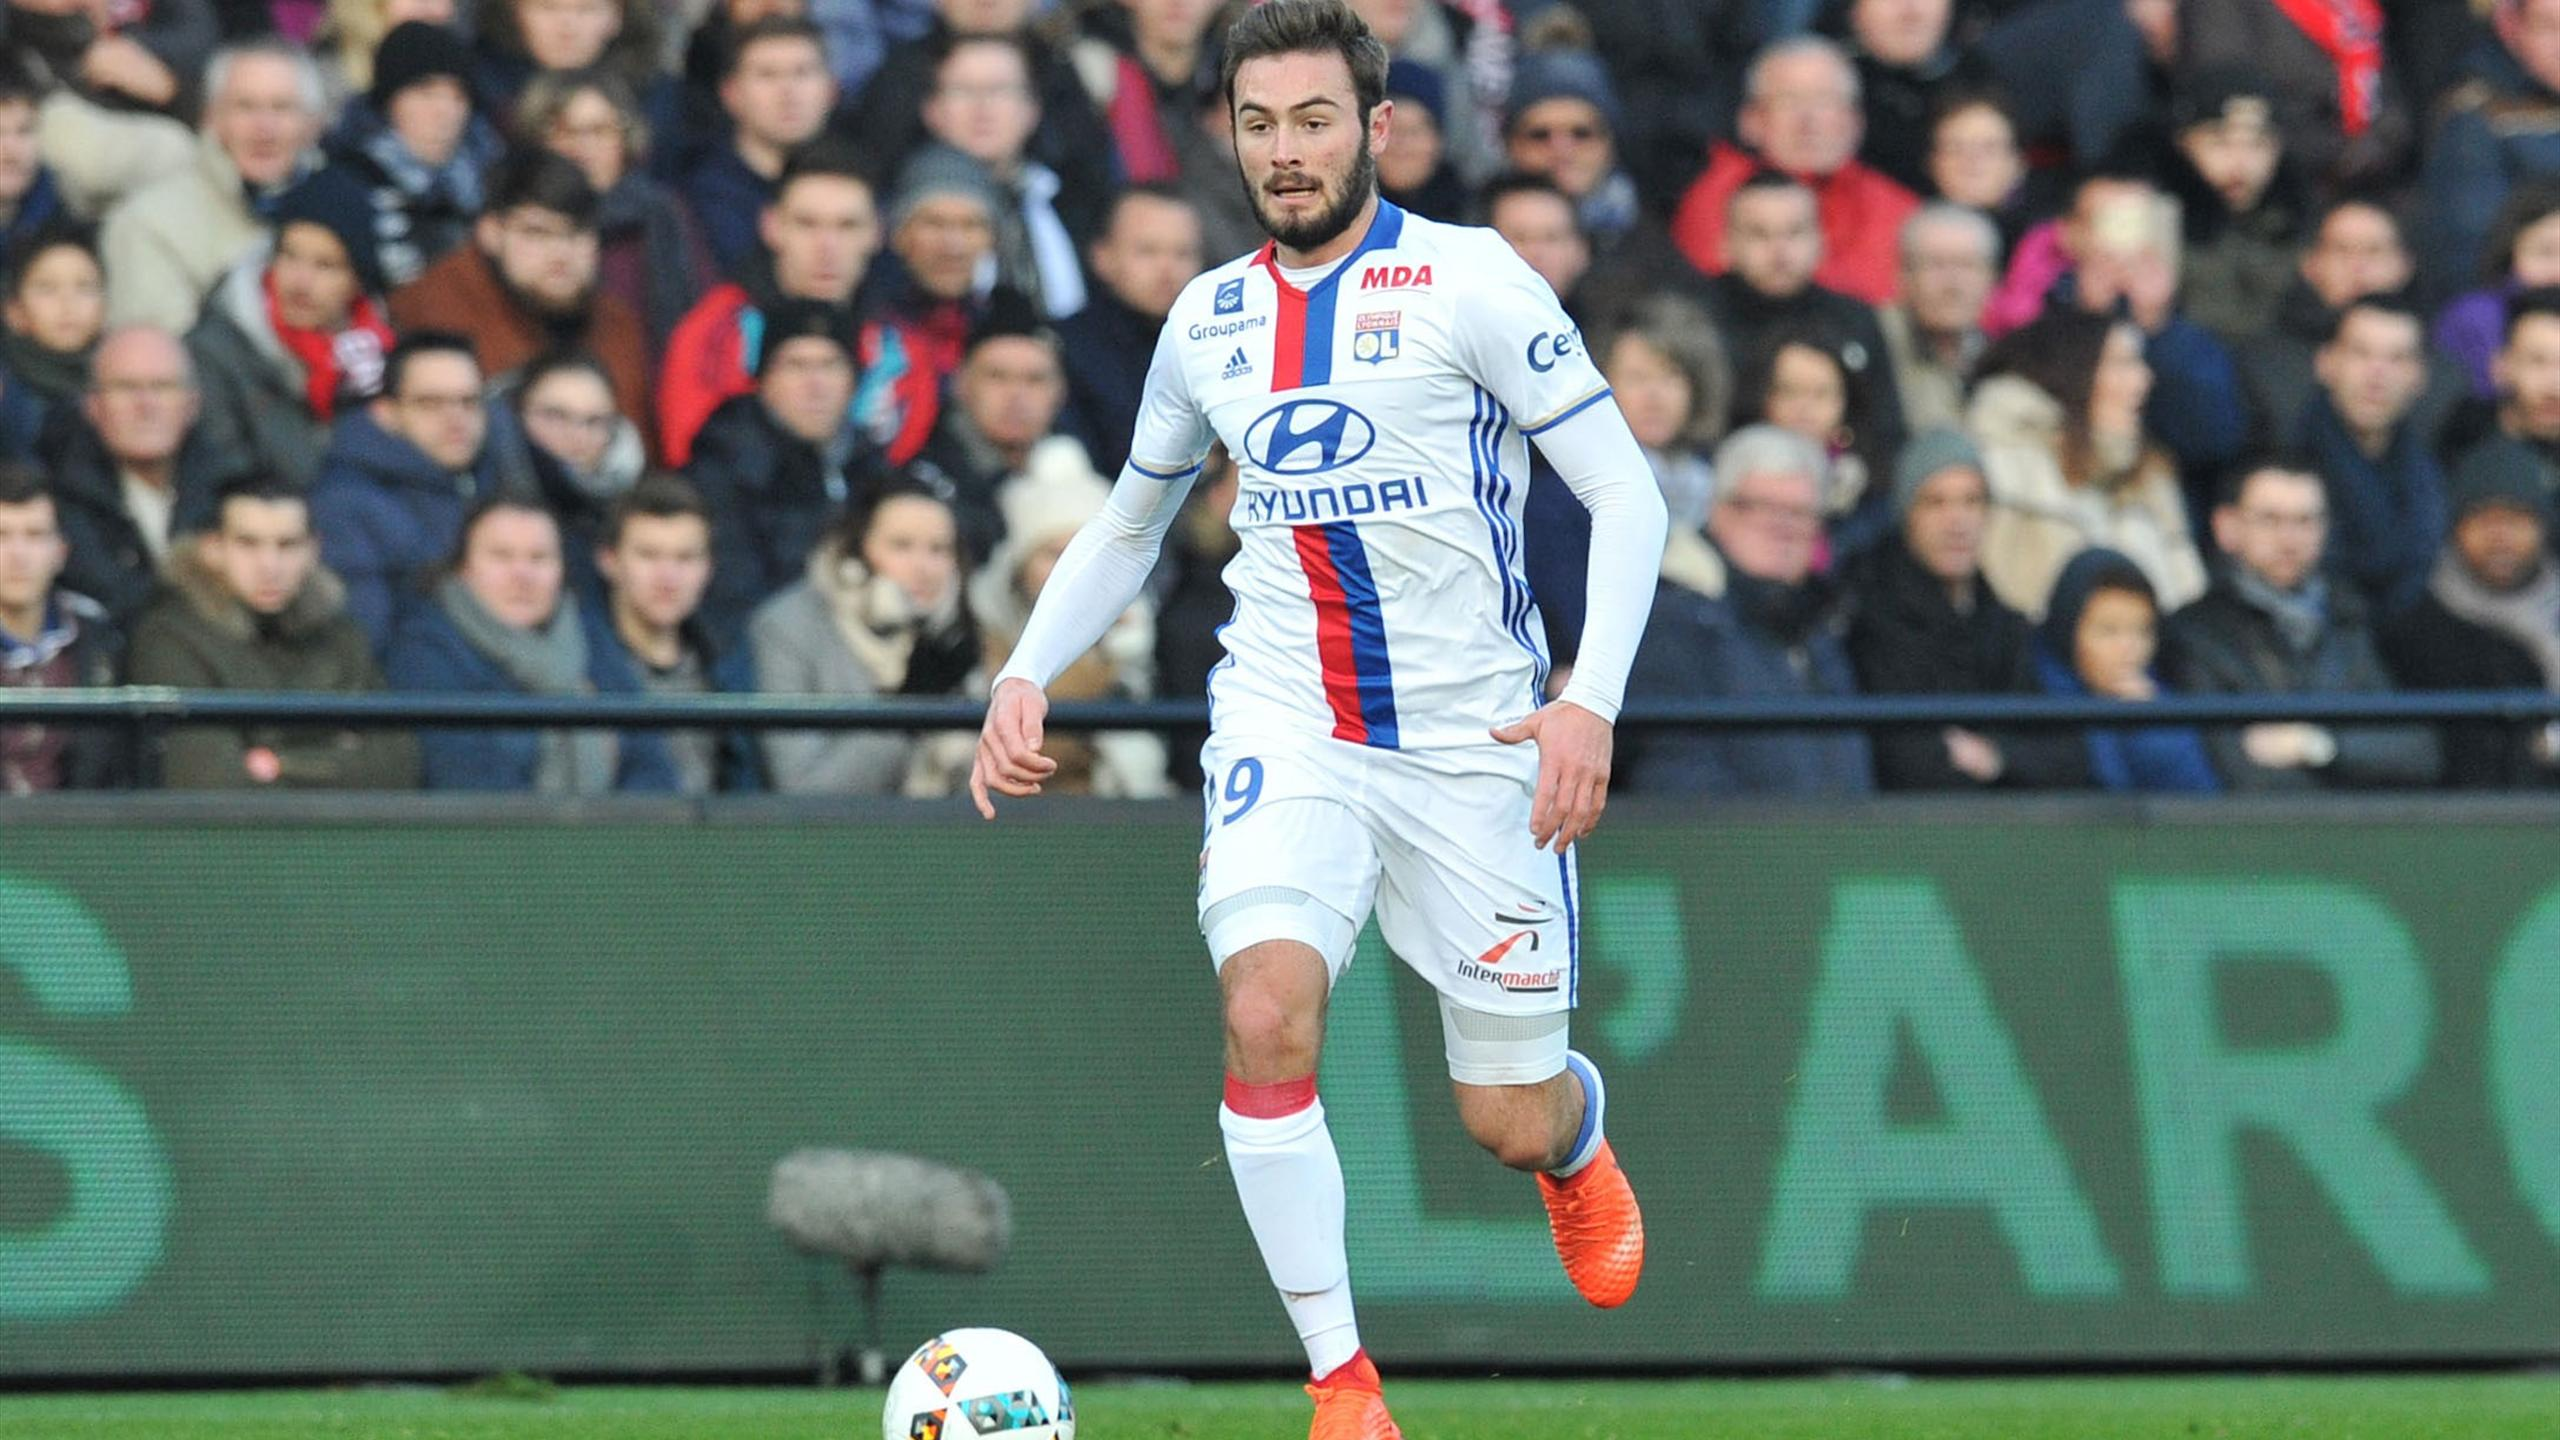 Maillot THIRD Olympique Lyonnais Lucas TOUSART